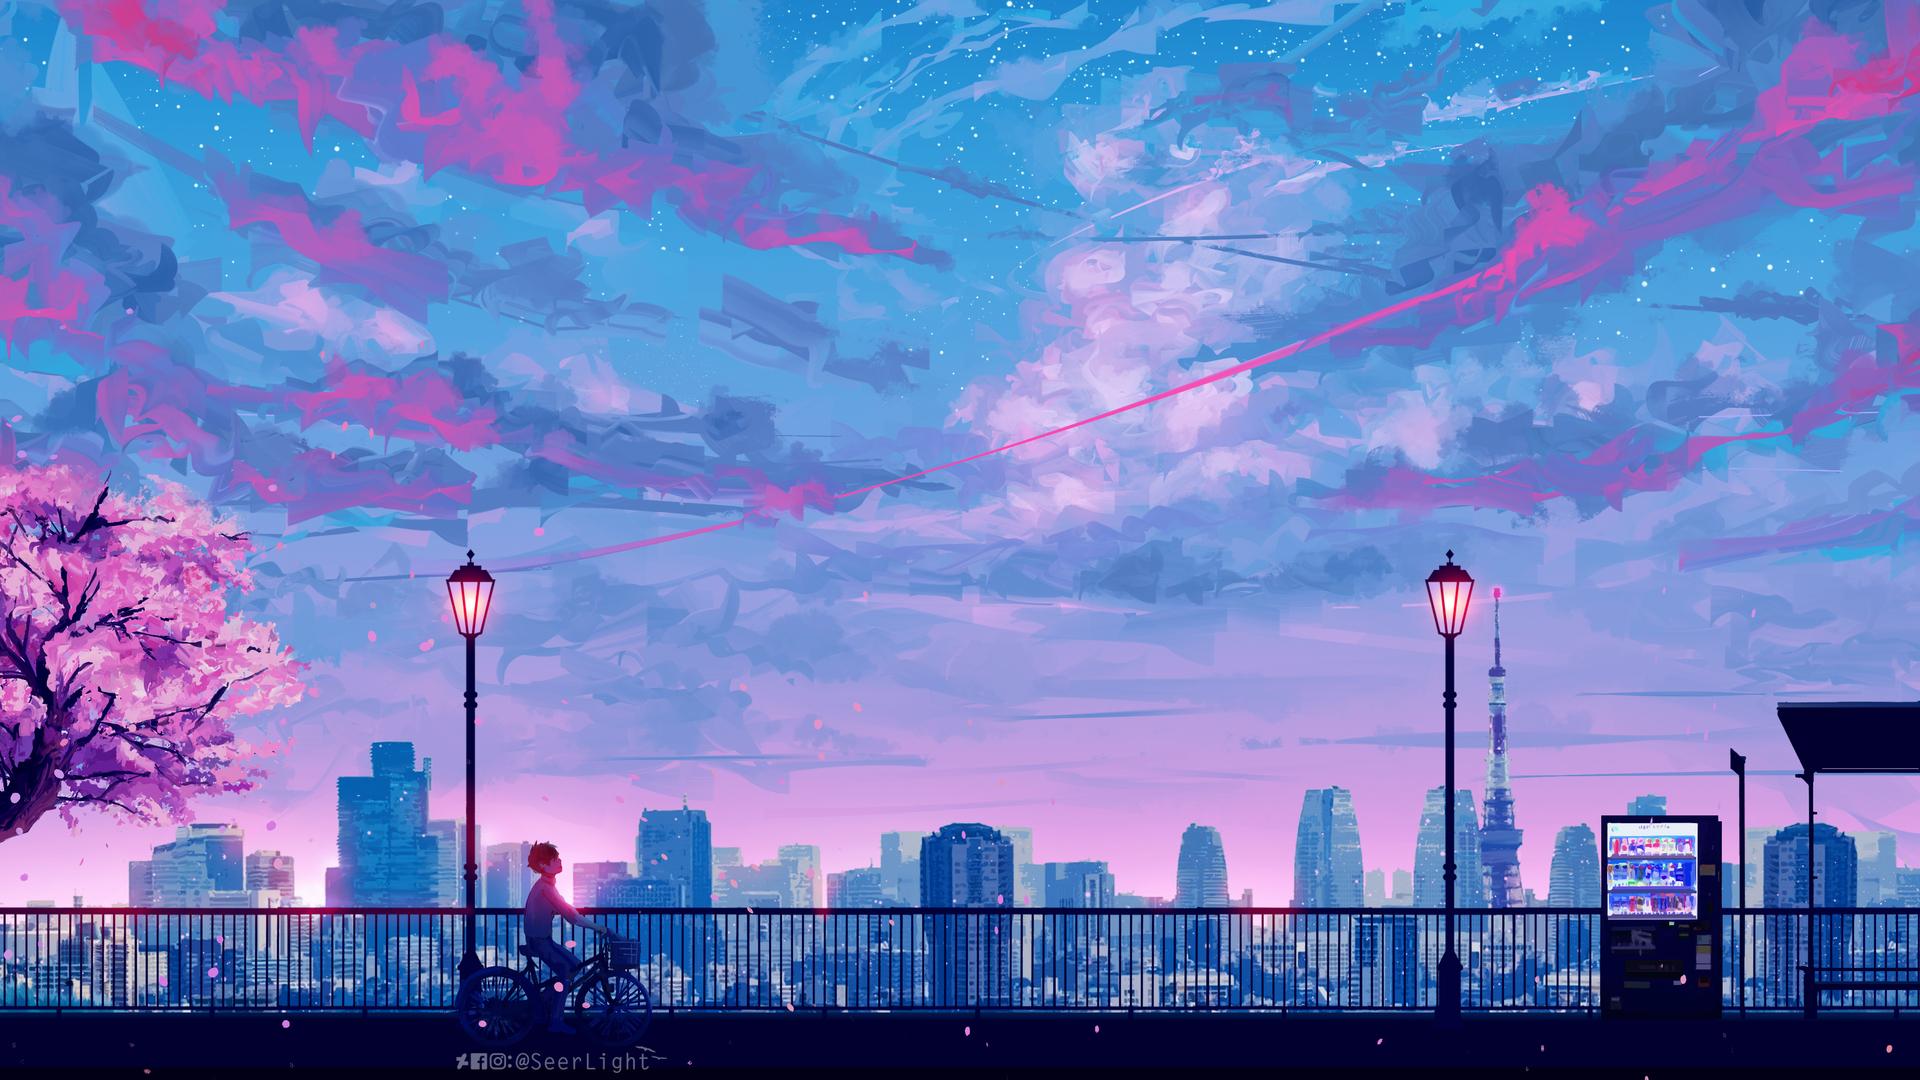 1920x1080 Anime Cityscape Landscape Scenery 5k Laptop Full ...